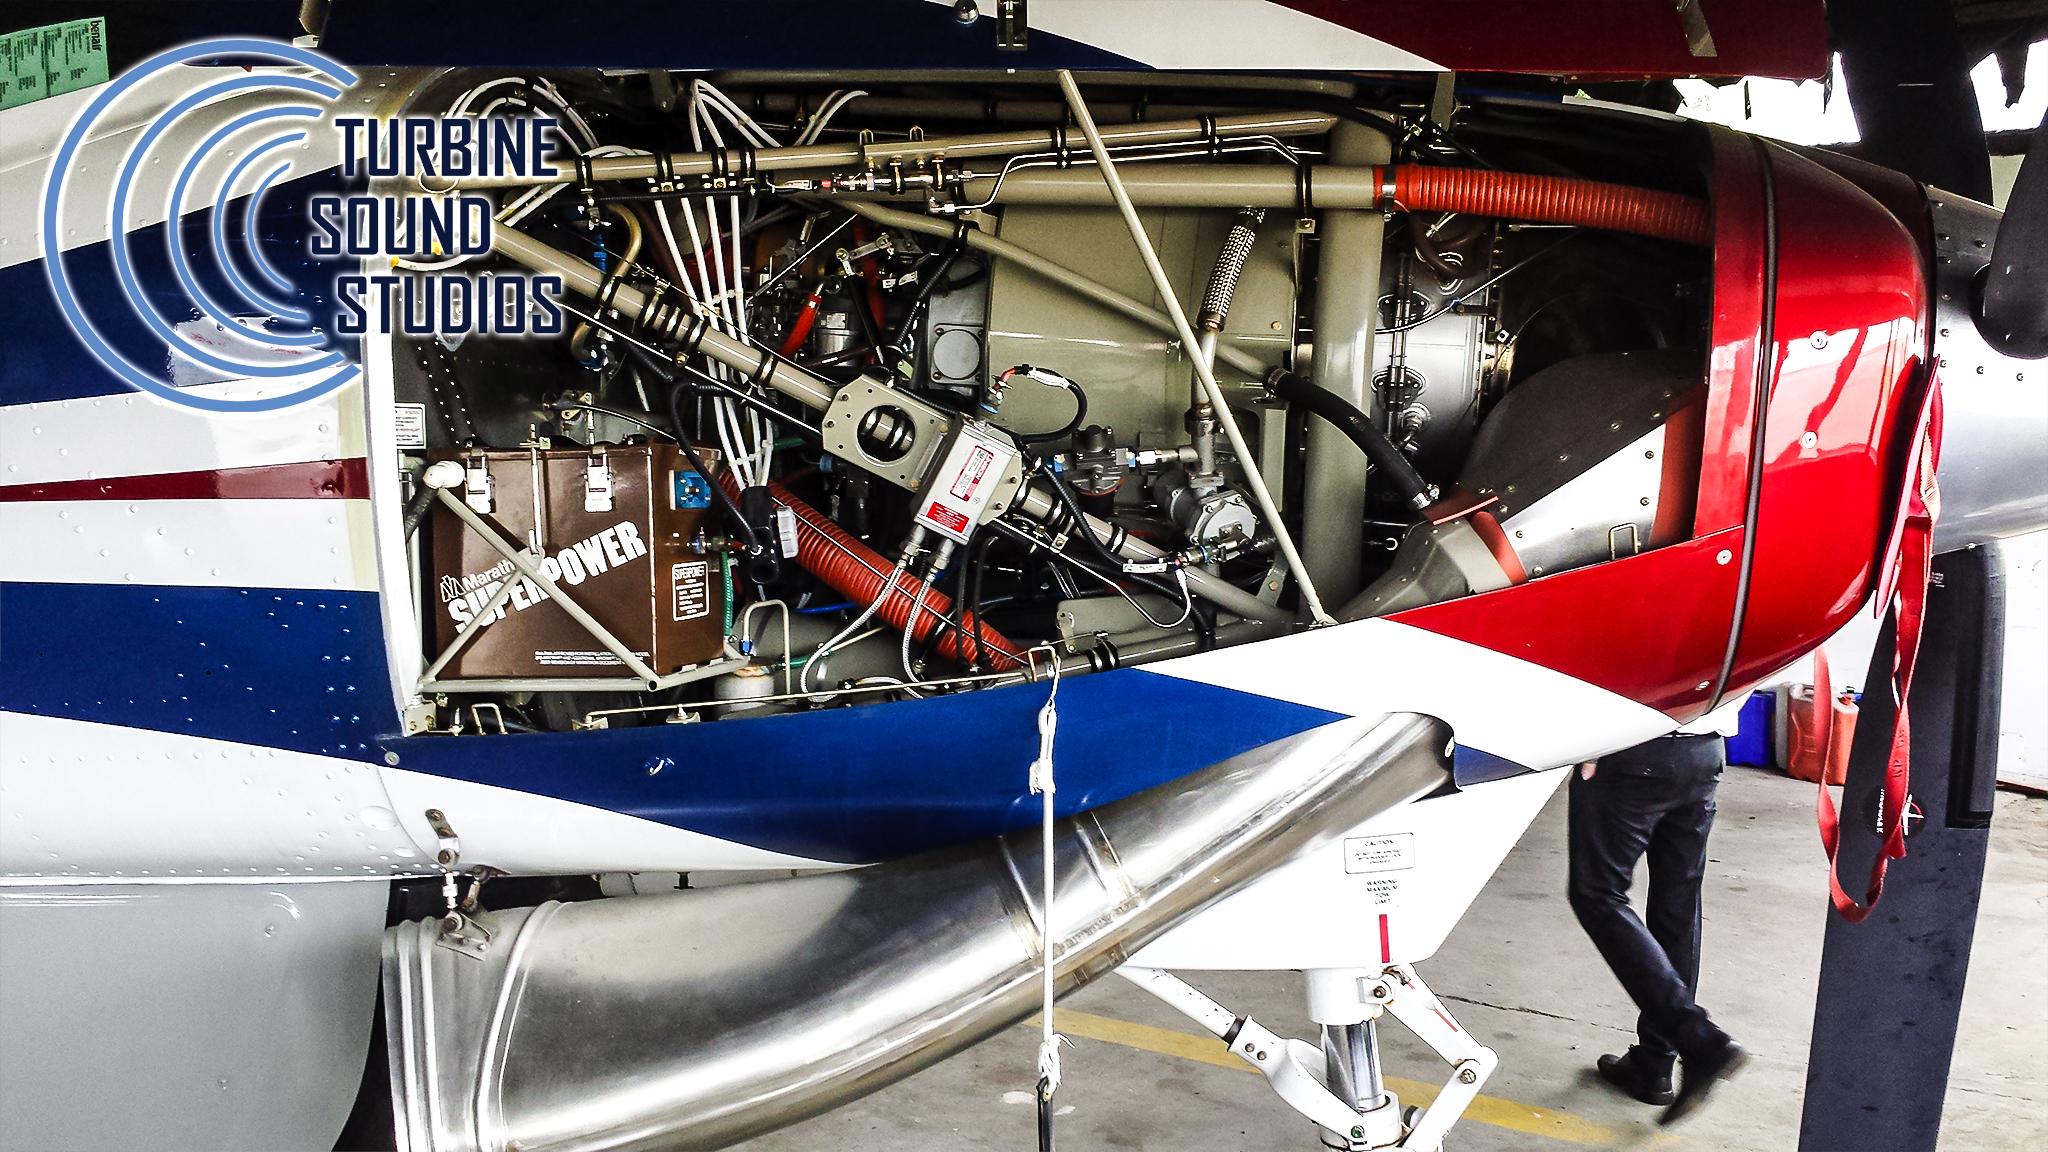 TURBINE SOUND STUDIOS – 塞斯纳208 PW-PT6 高清音效包飞行员版本FSX P3D